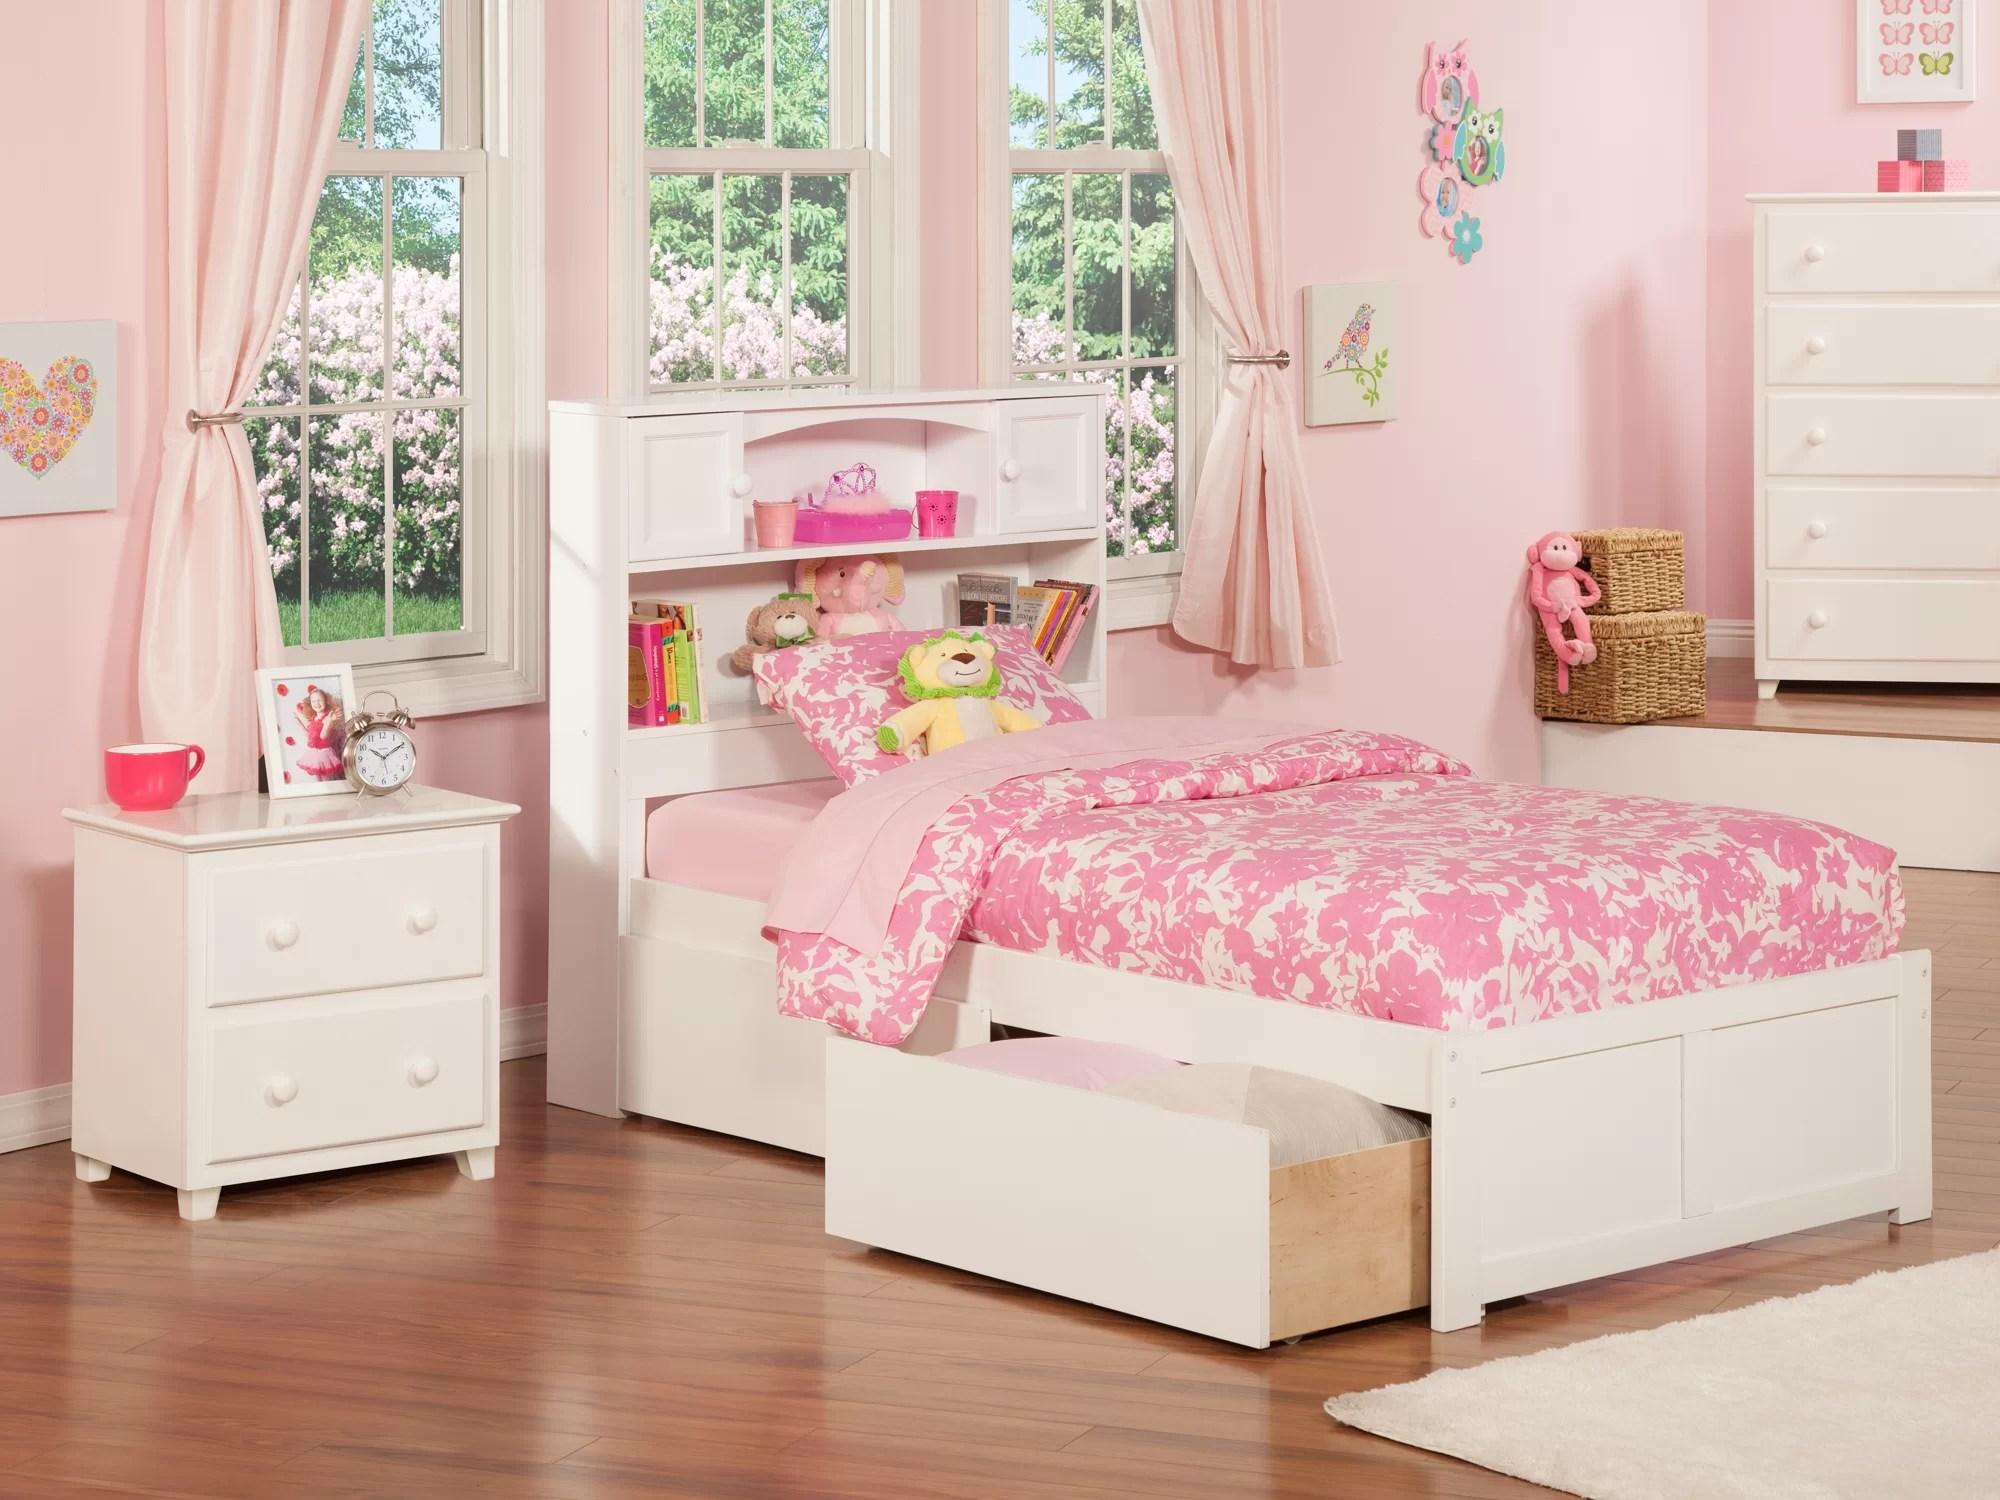 Kids Bedroom Sets You Ll Love In 2020 Wayfair